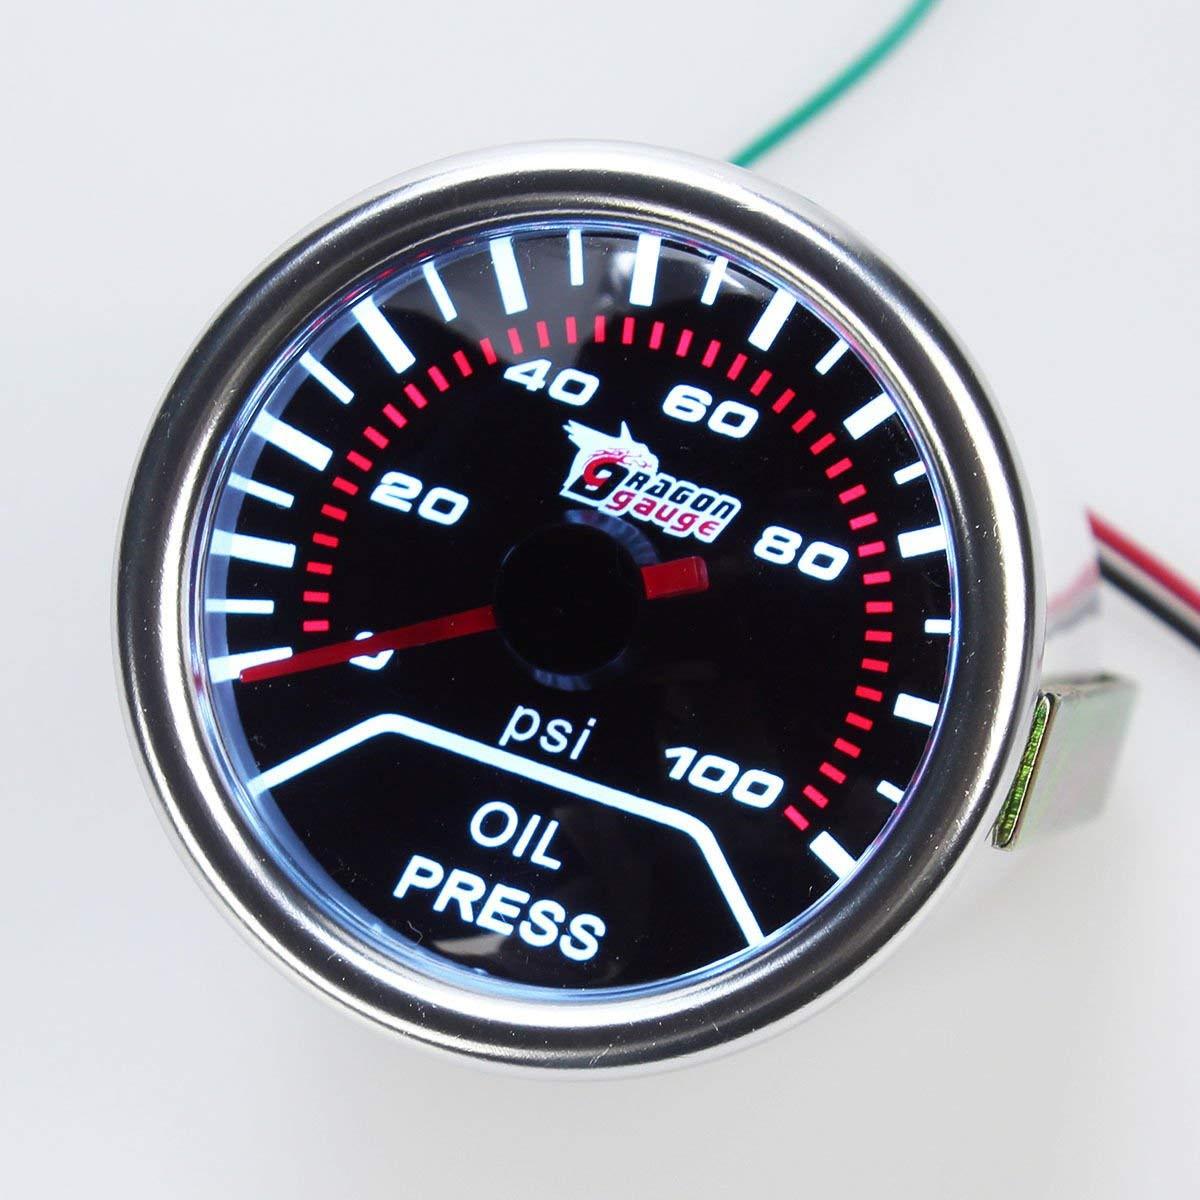 Cheap 6 Volt Tachometer, find 6 Volt Tachometer deals on line at